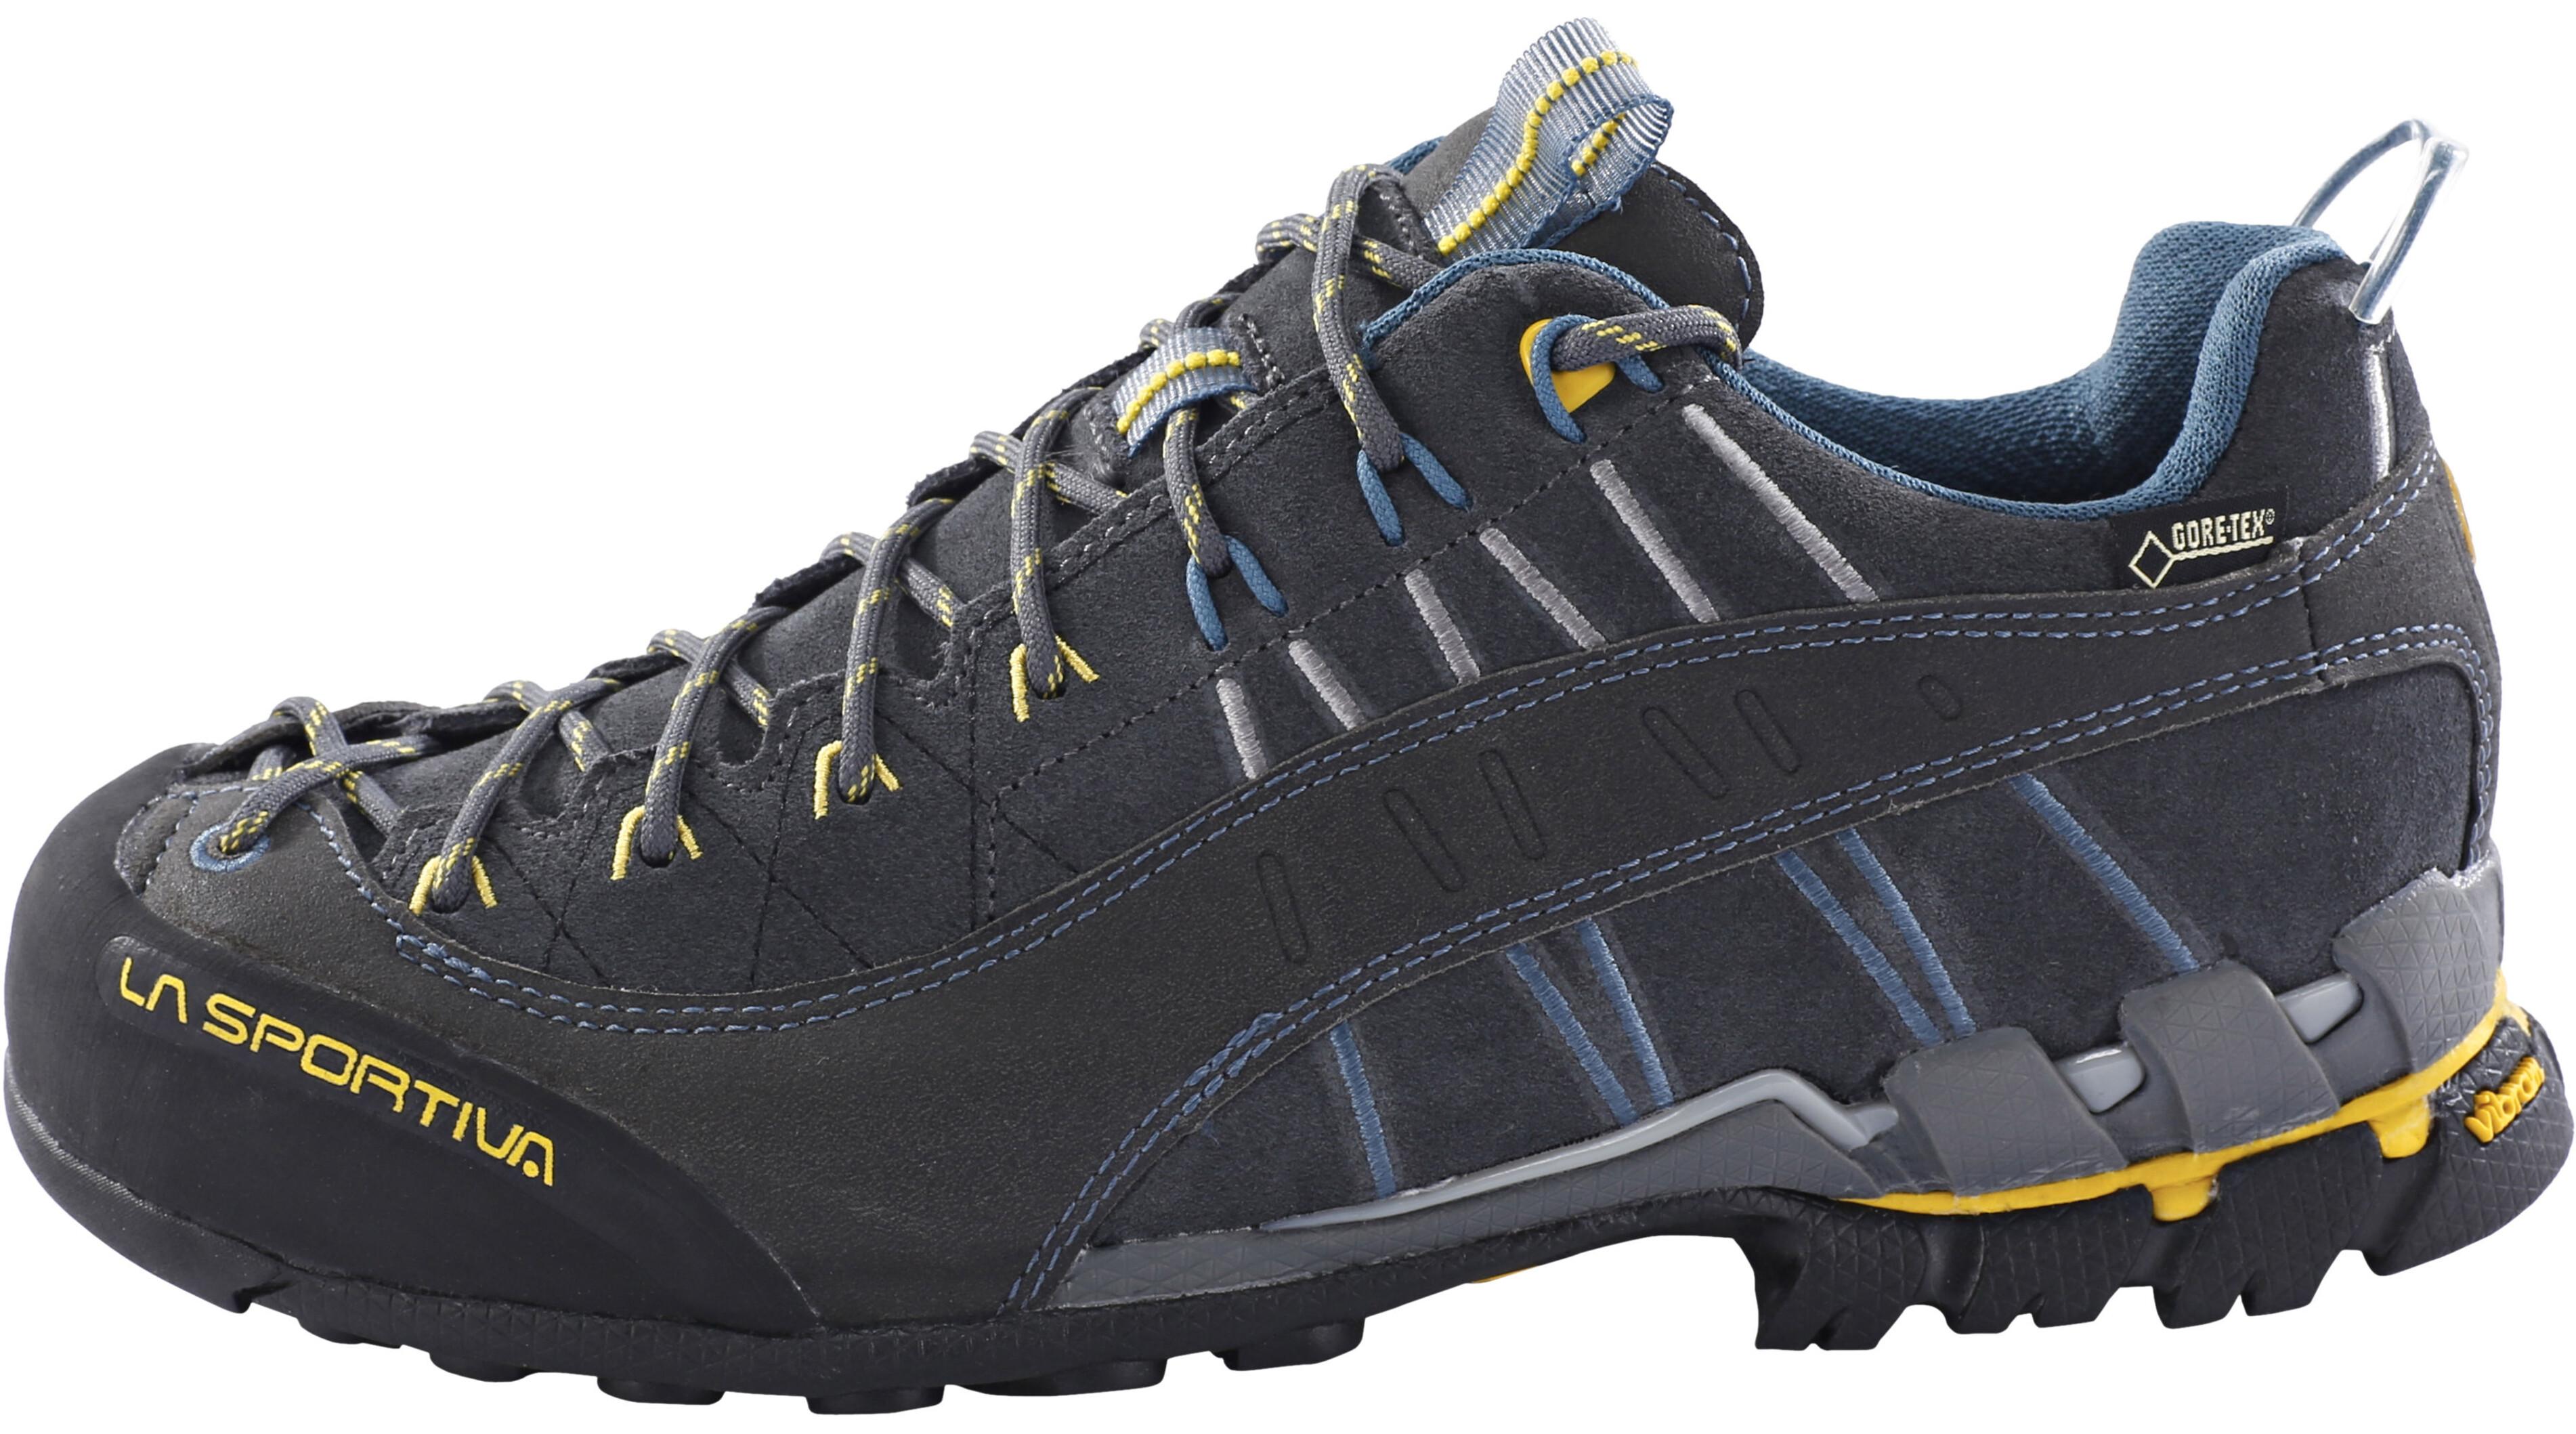 537b7f1d8e72c La Sportiva Hyper GTX - Calzado Hombre - gris